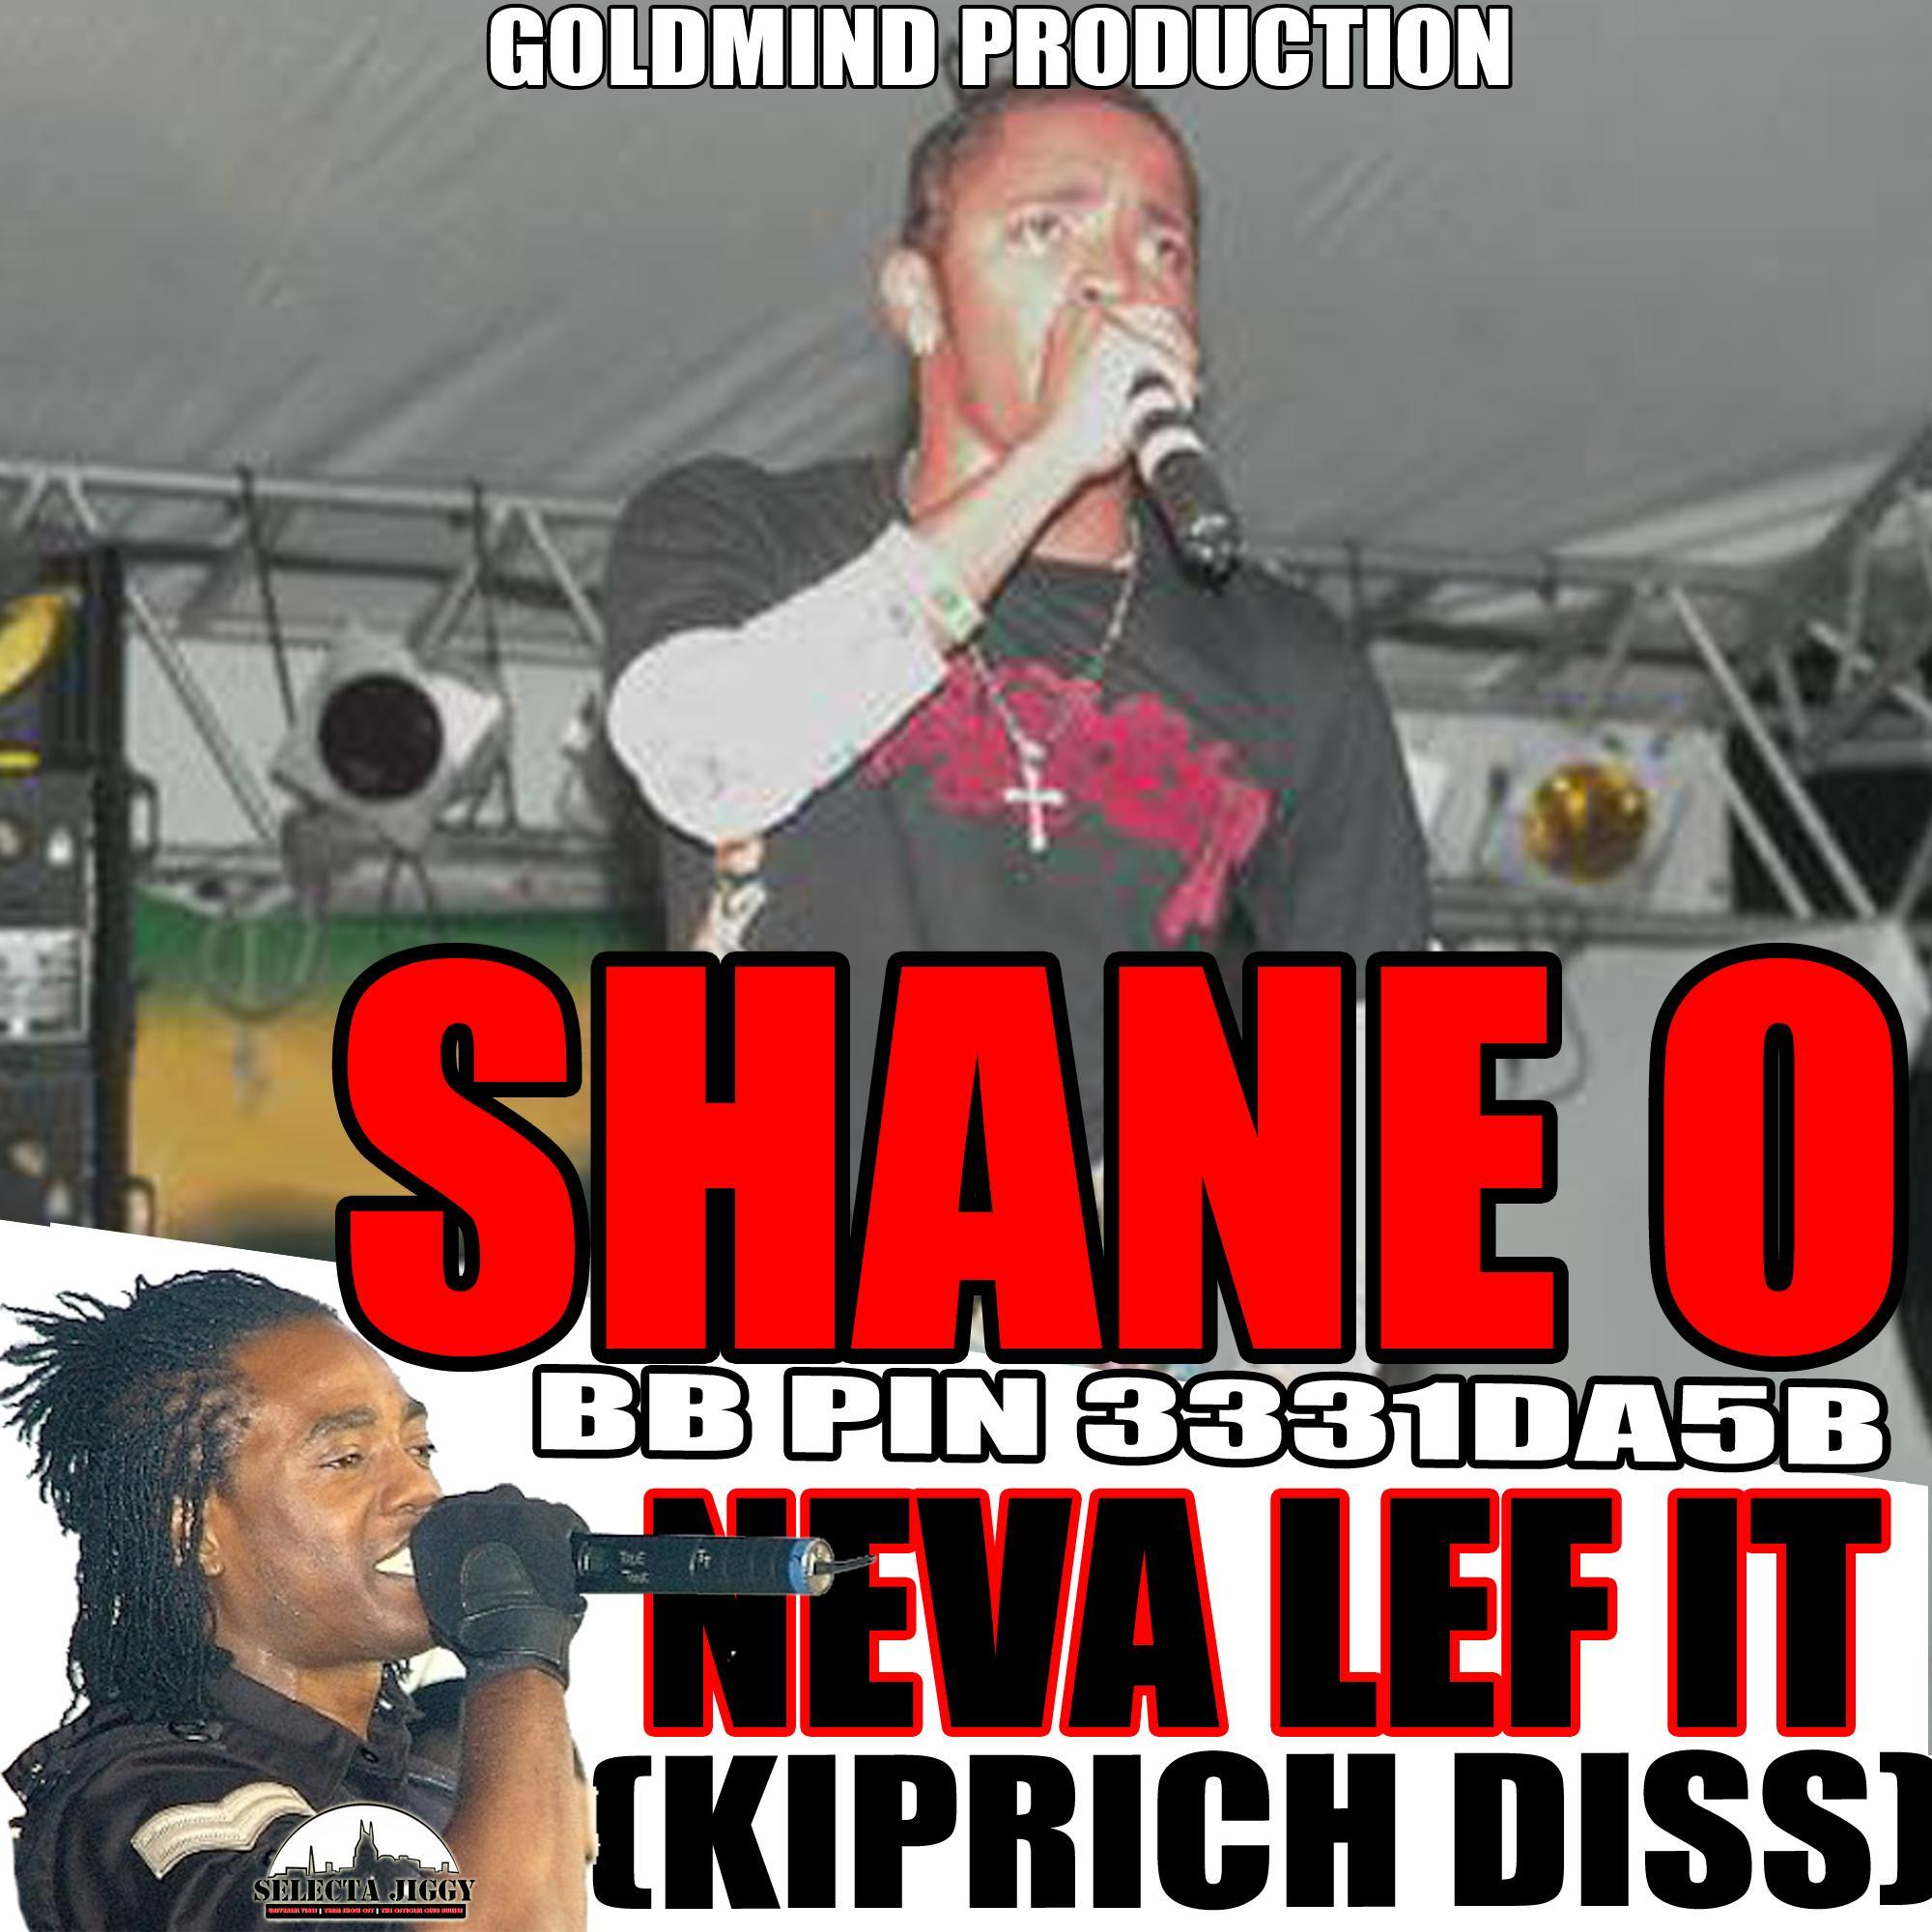 SHANE O – NEVA LEF IT (KIPRICH DISS) – GOLDMIND PRODUCTION